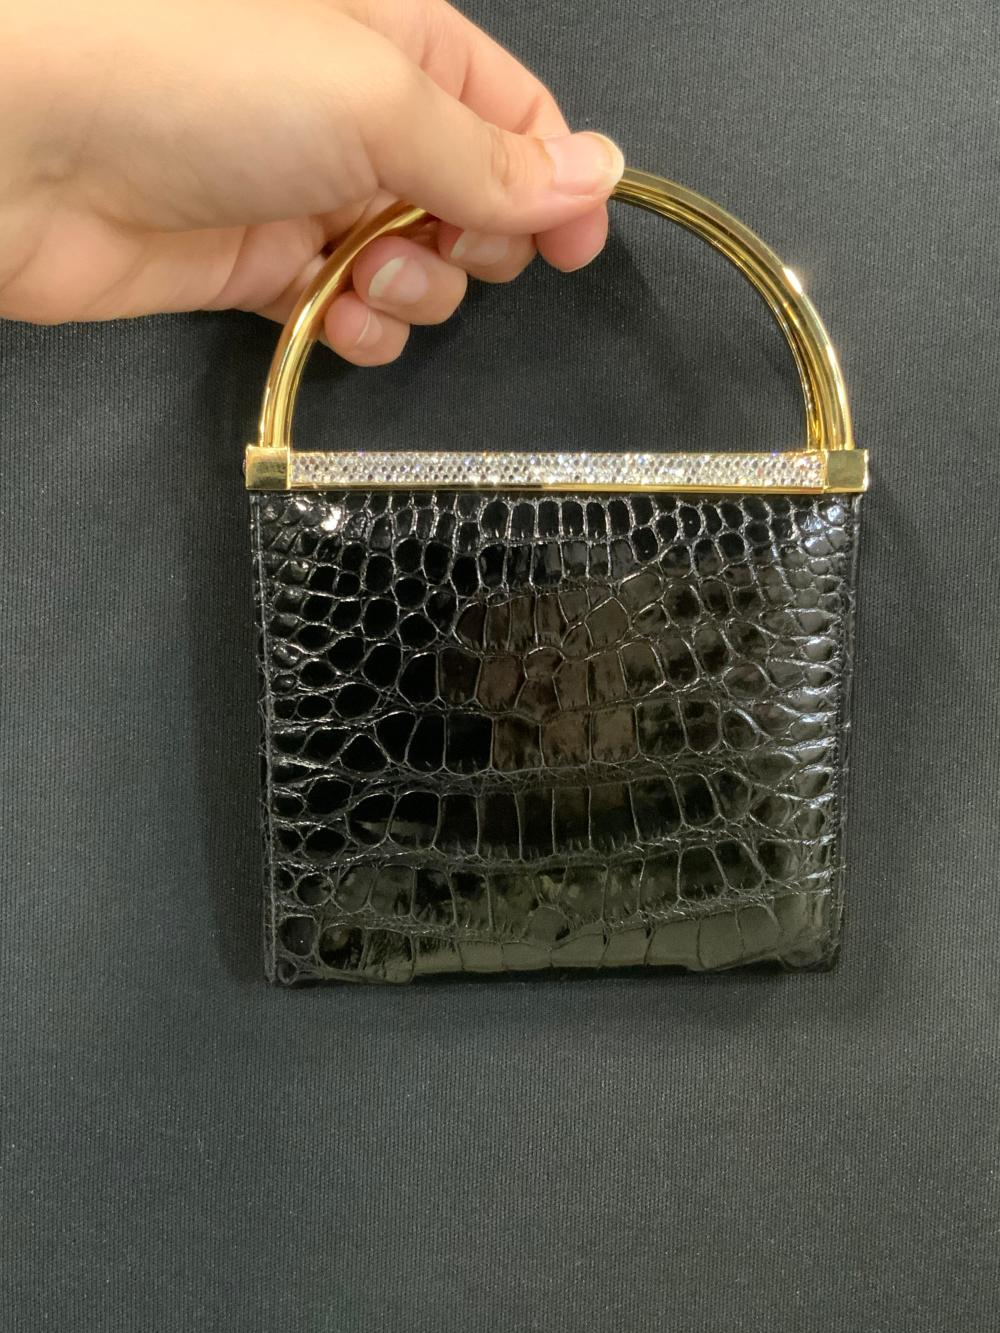 Vntg JUDITH LEIBER Black Croc Mini Purse W/ Tag